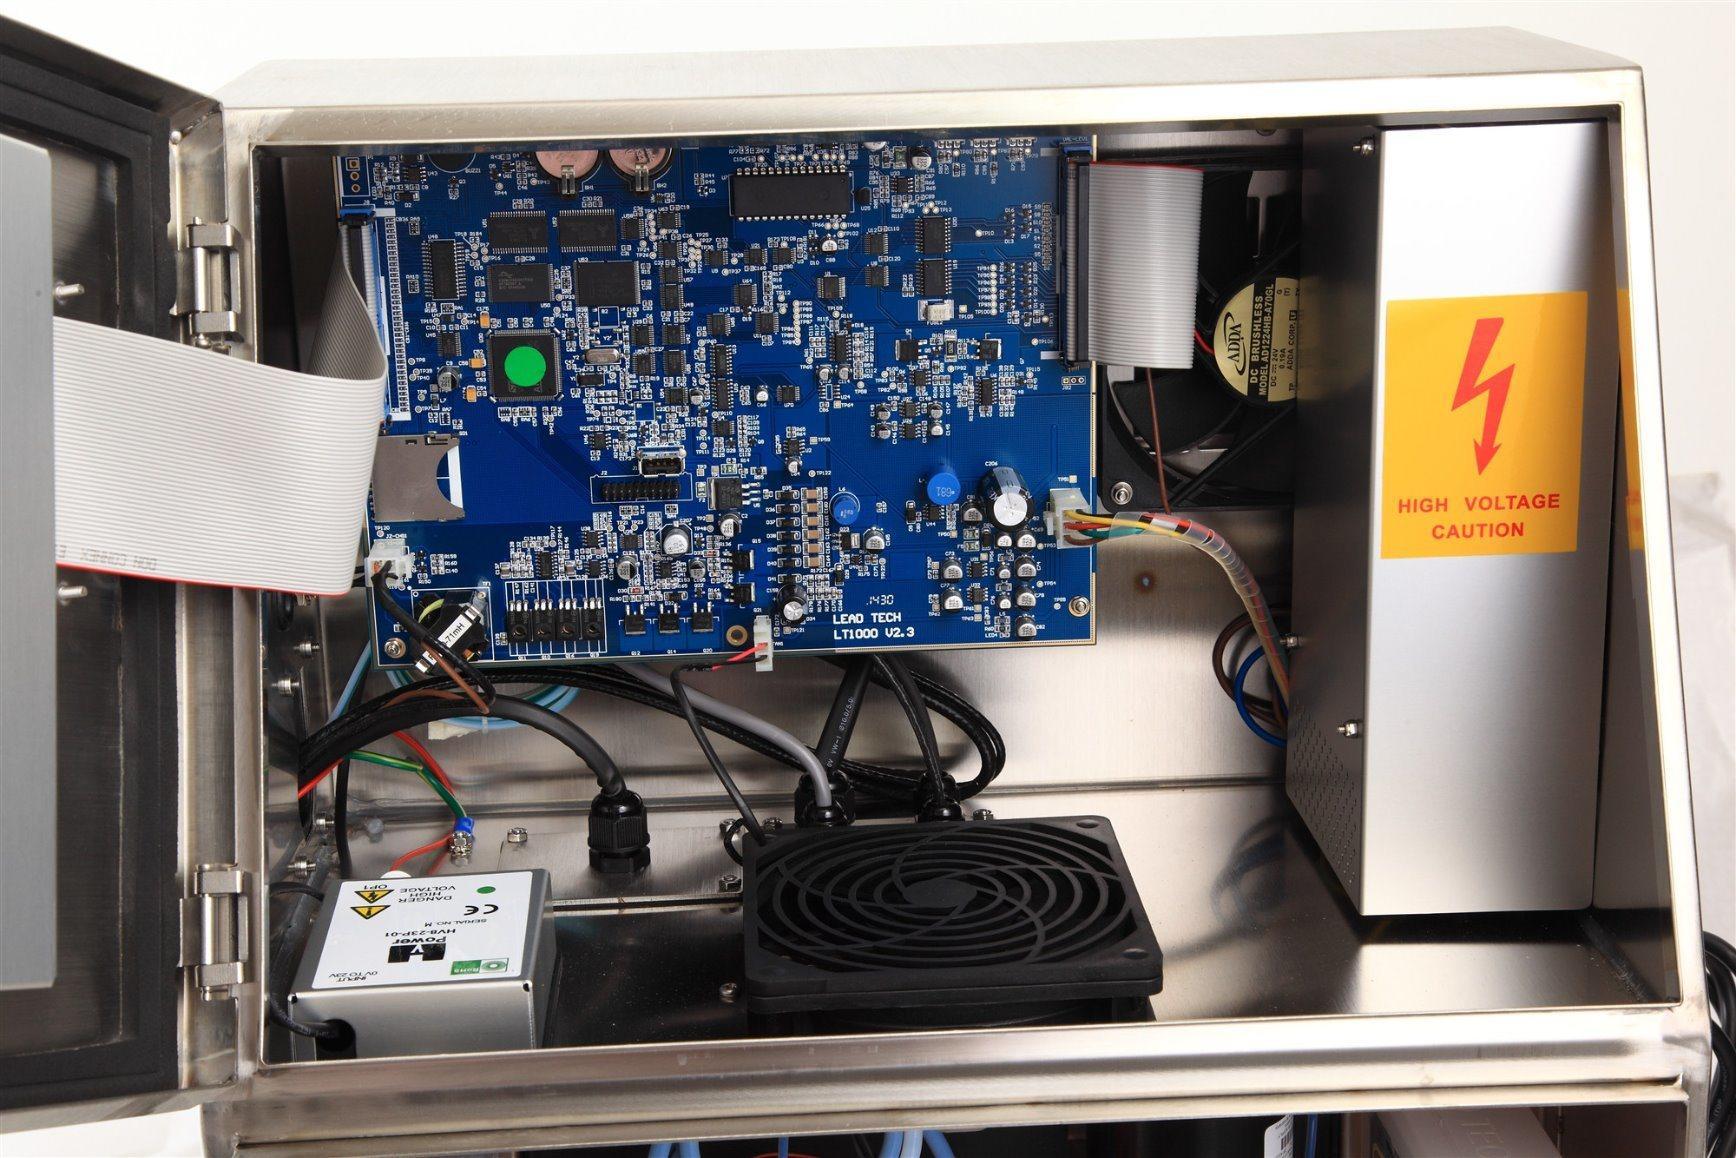 Lead Tech Lt720 White/Yellow/Red Pigment Inkjet Coding Machine